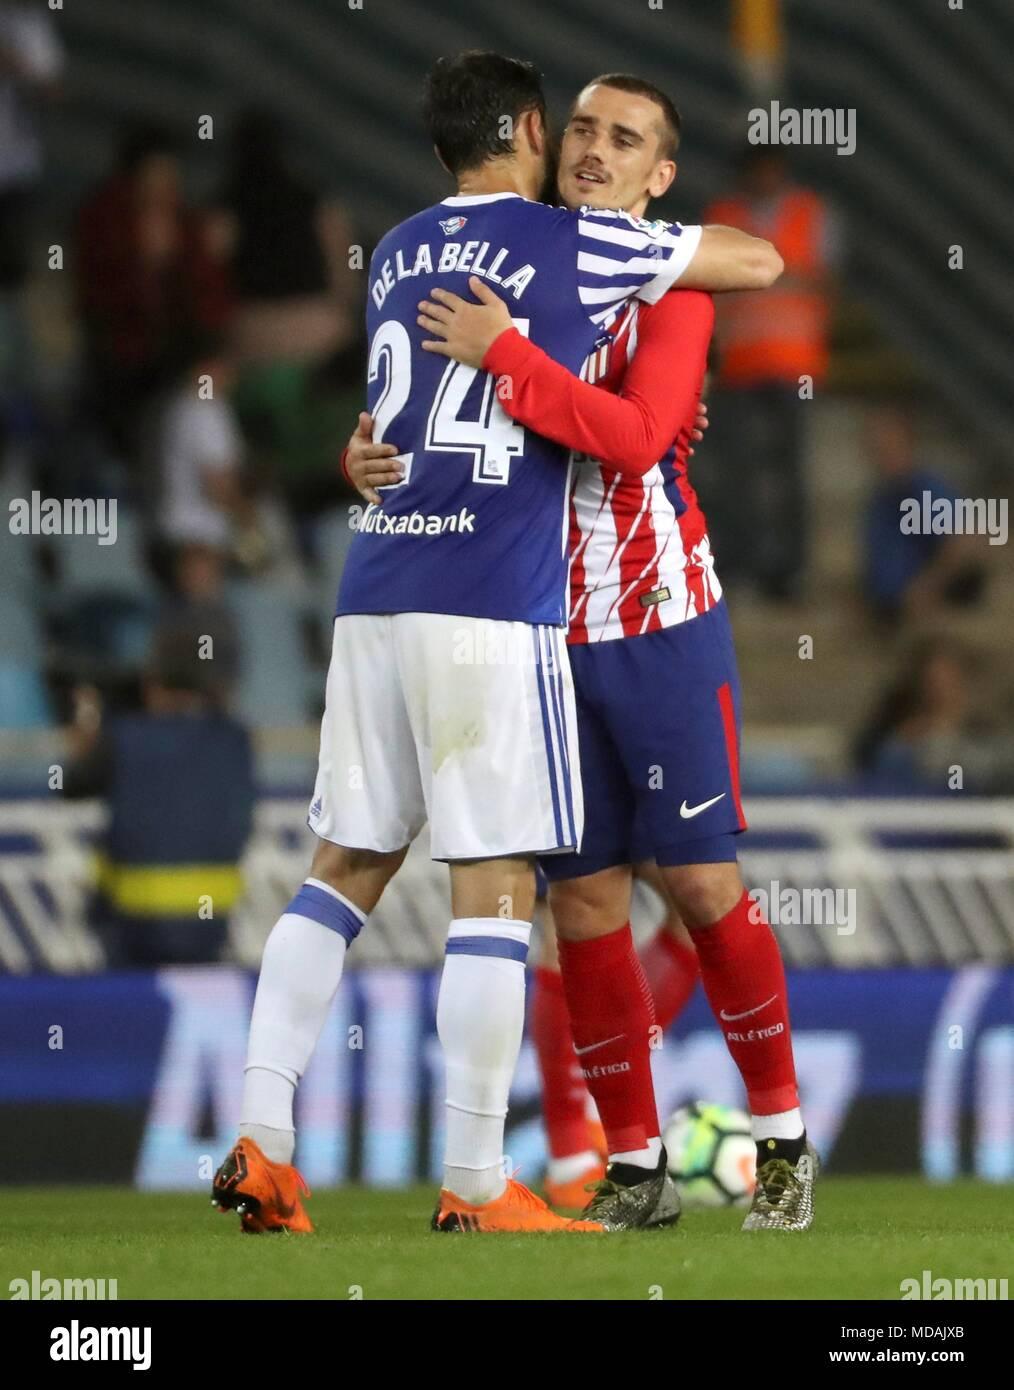 online store b4a1c 83c4b Real Sociedad's Alberto de la Bella (L) greets former ...